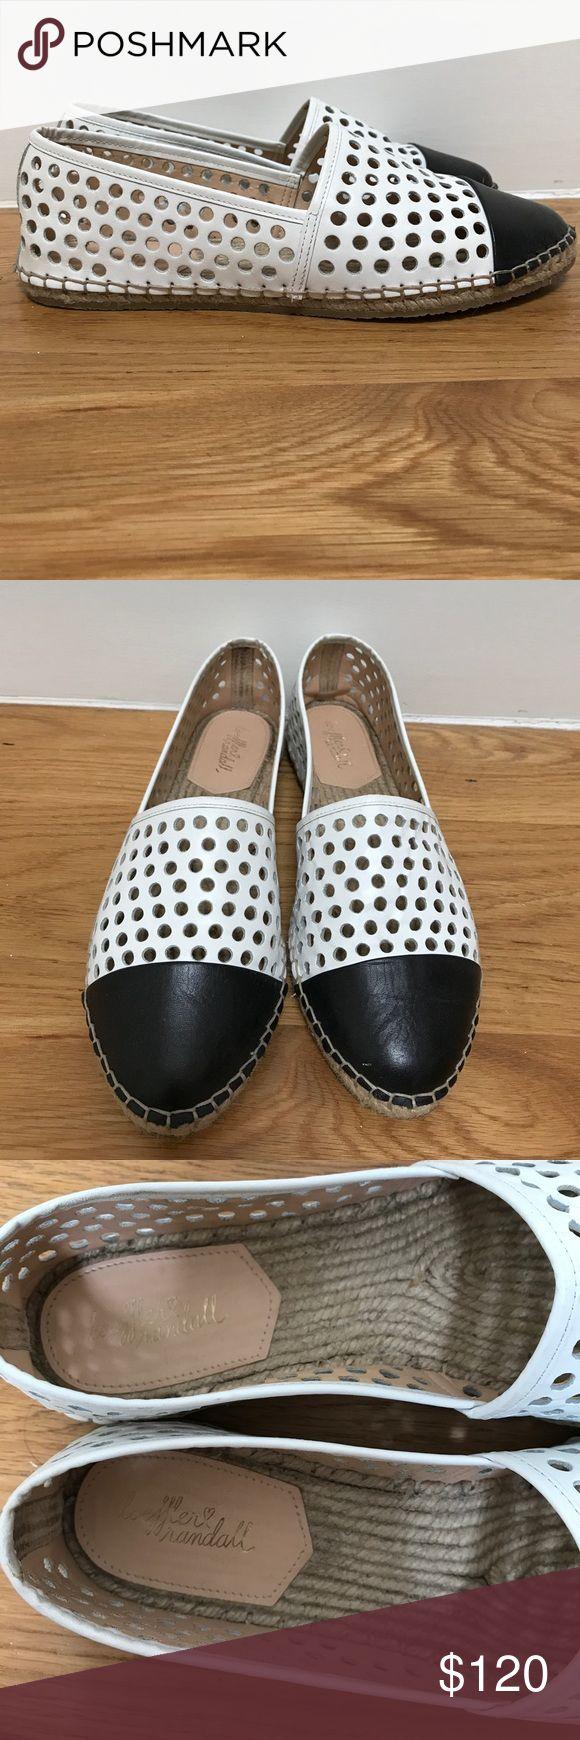 Loeffler Randall espadrilles Brand new worn once black and white espadrilles Loeffler Randall Shoes Espadrilles